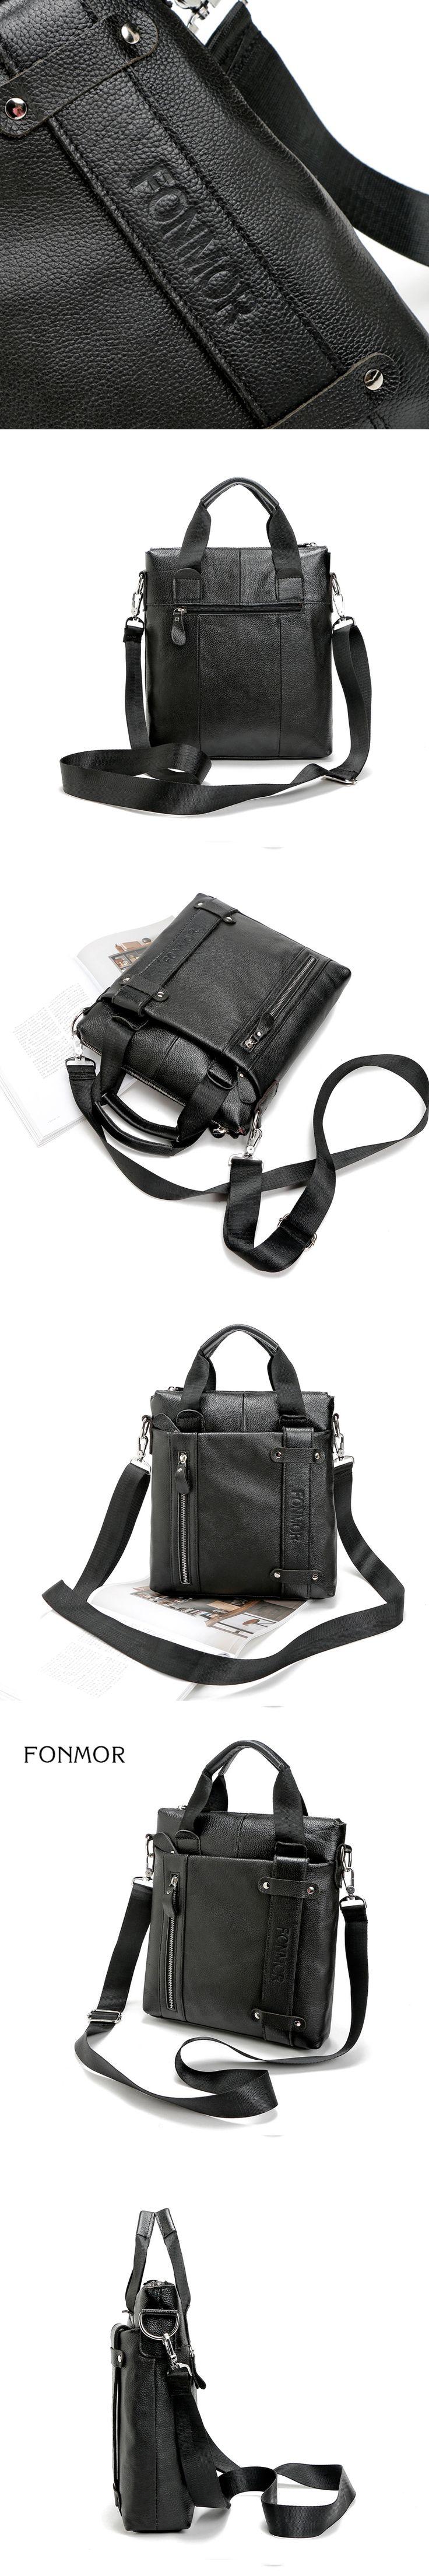 Fonmor Men Messenger Bags Luxury Handbags Genuine Leather Men Bag High Quality Shoulder Bag Casual Zipper Office Bags For Men